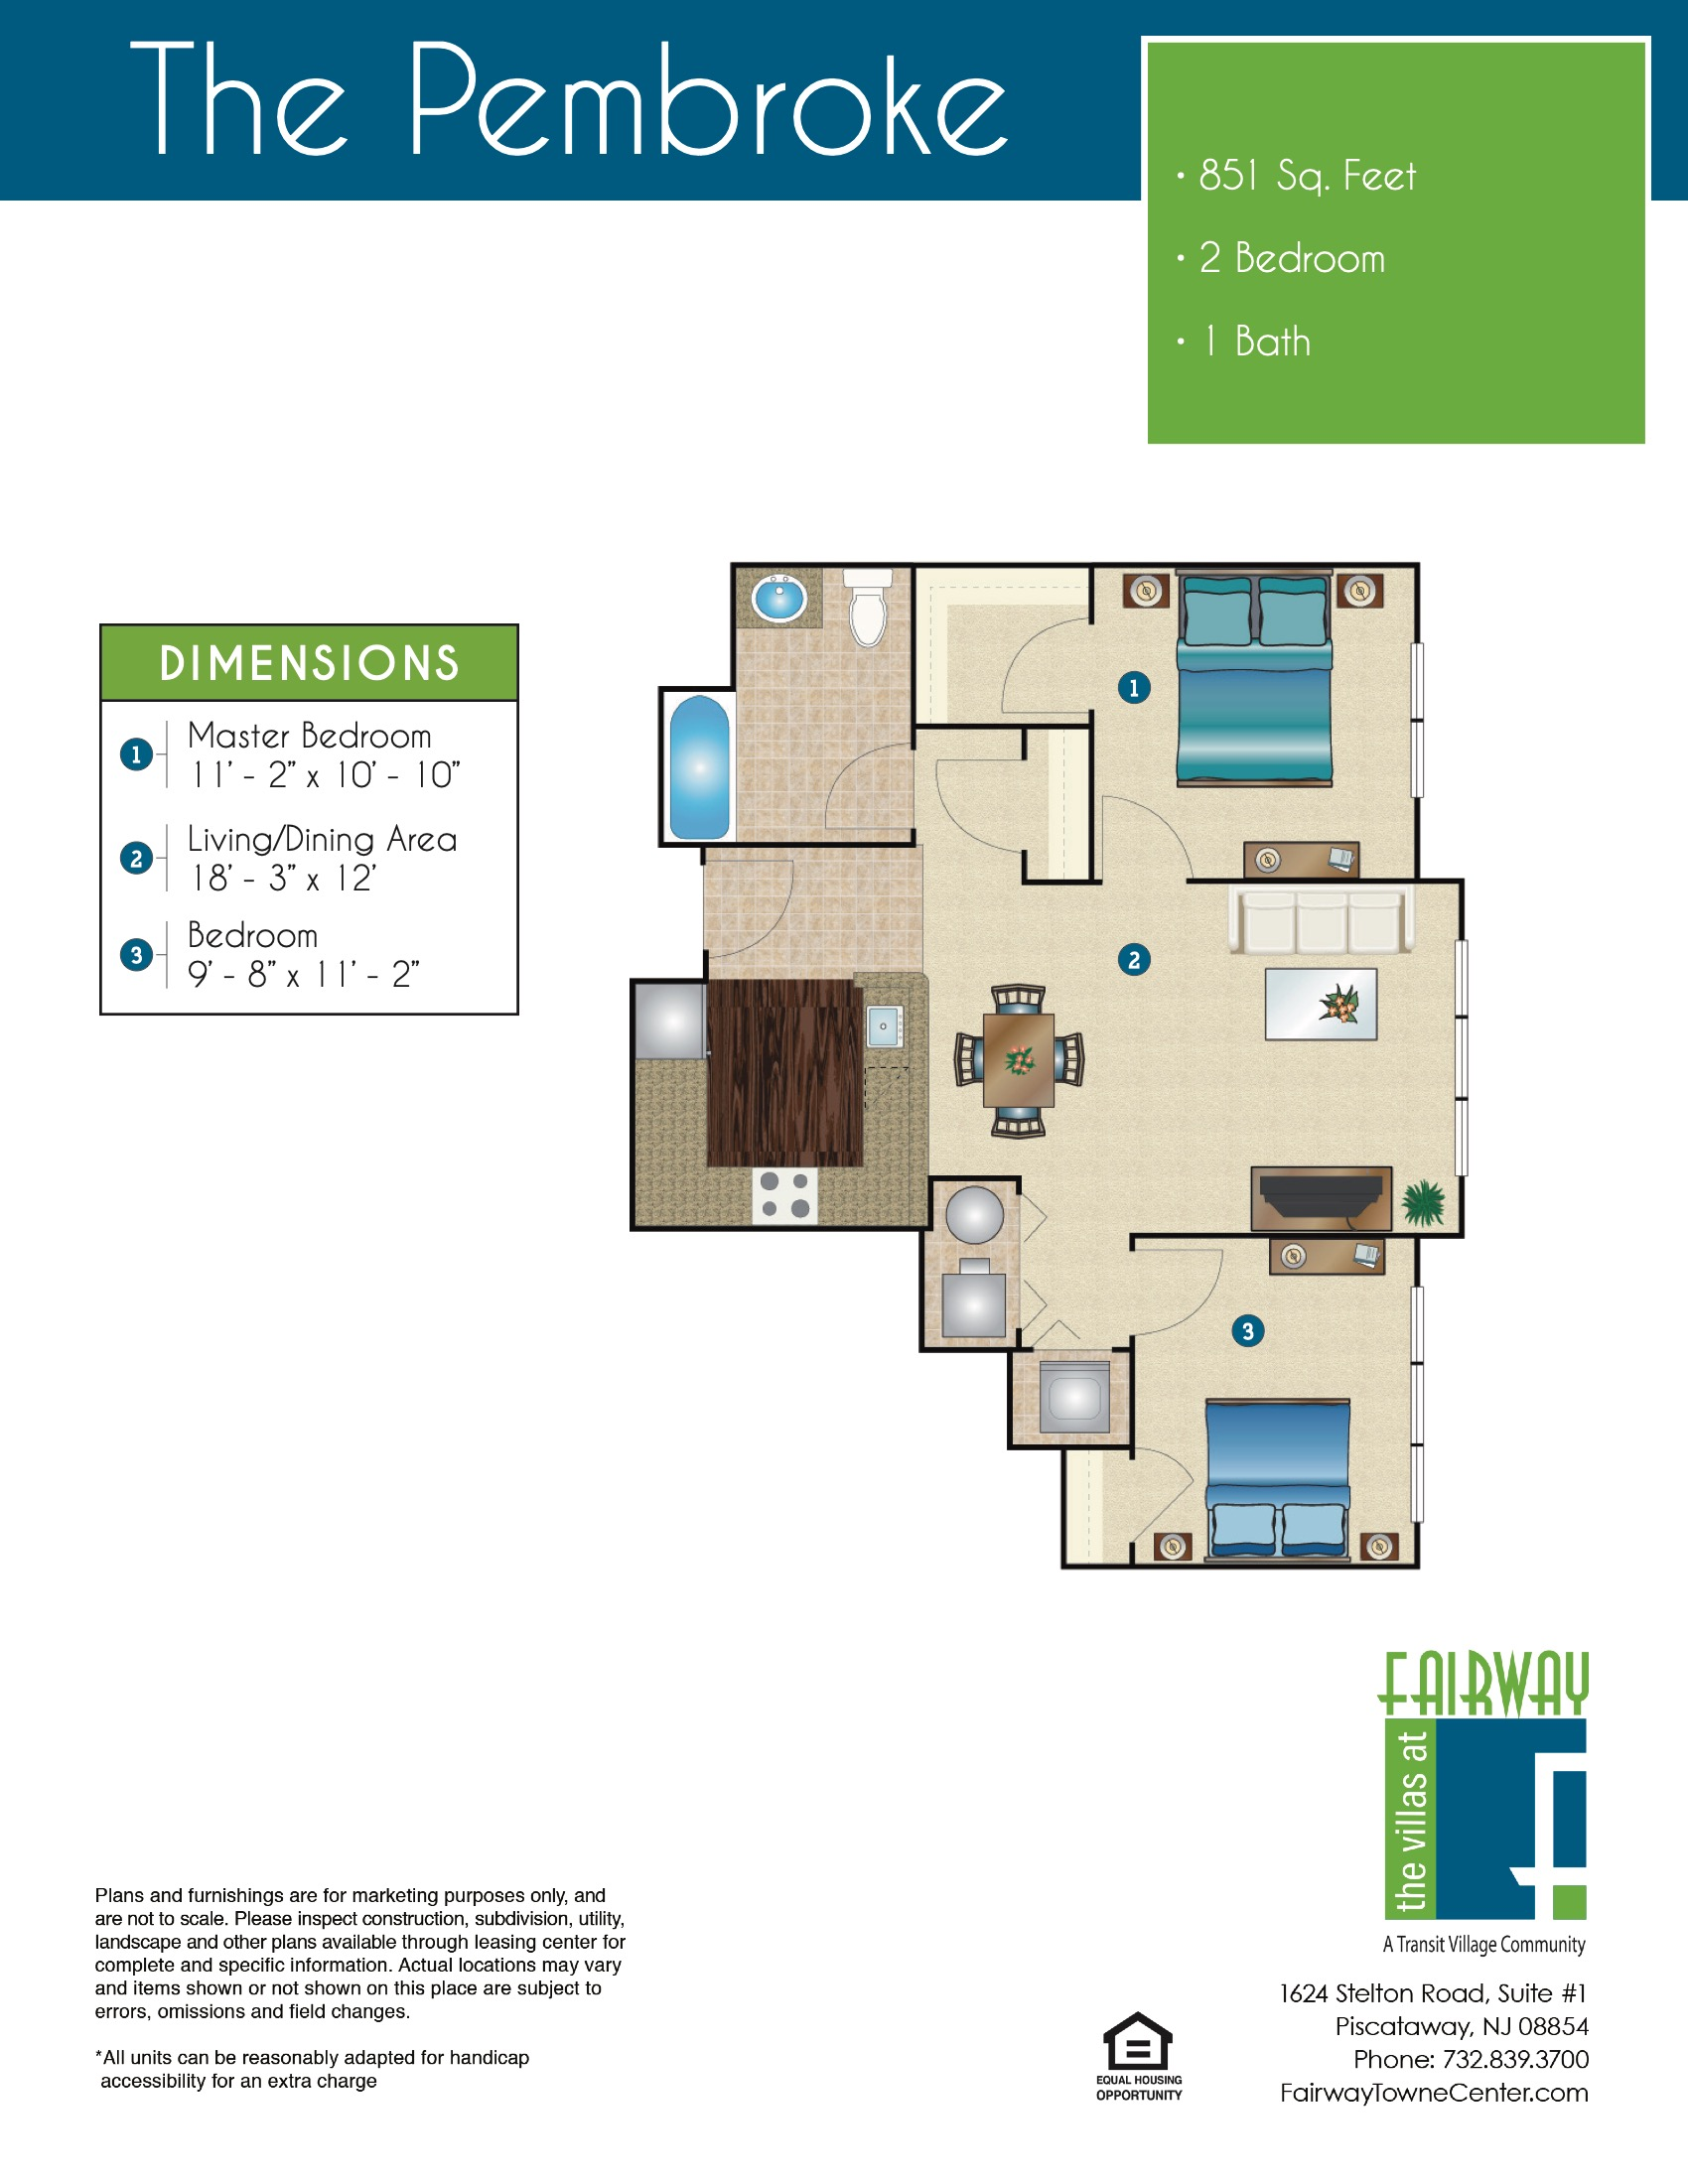 The Pembroke Floor Plan